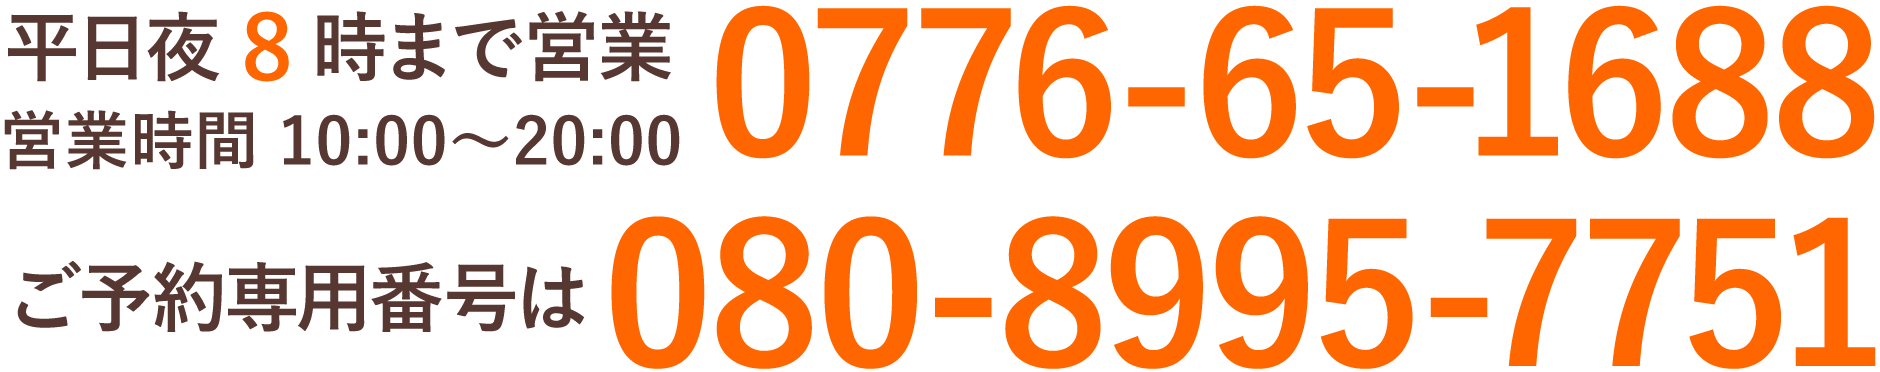 0776-65-1688